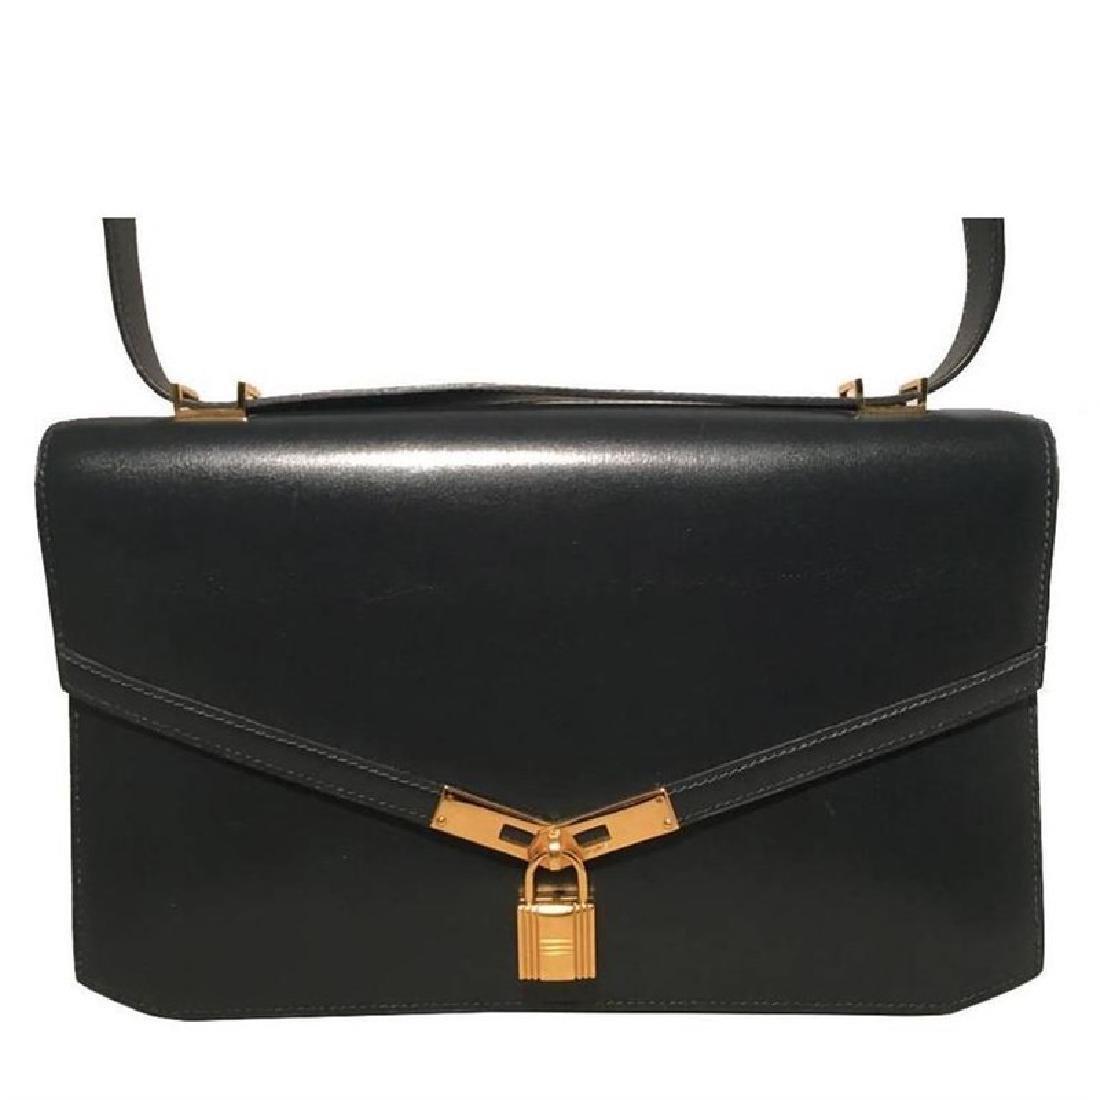 Hermes Vintage Navy Blue Leather Kelly Lock Front Flap